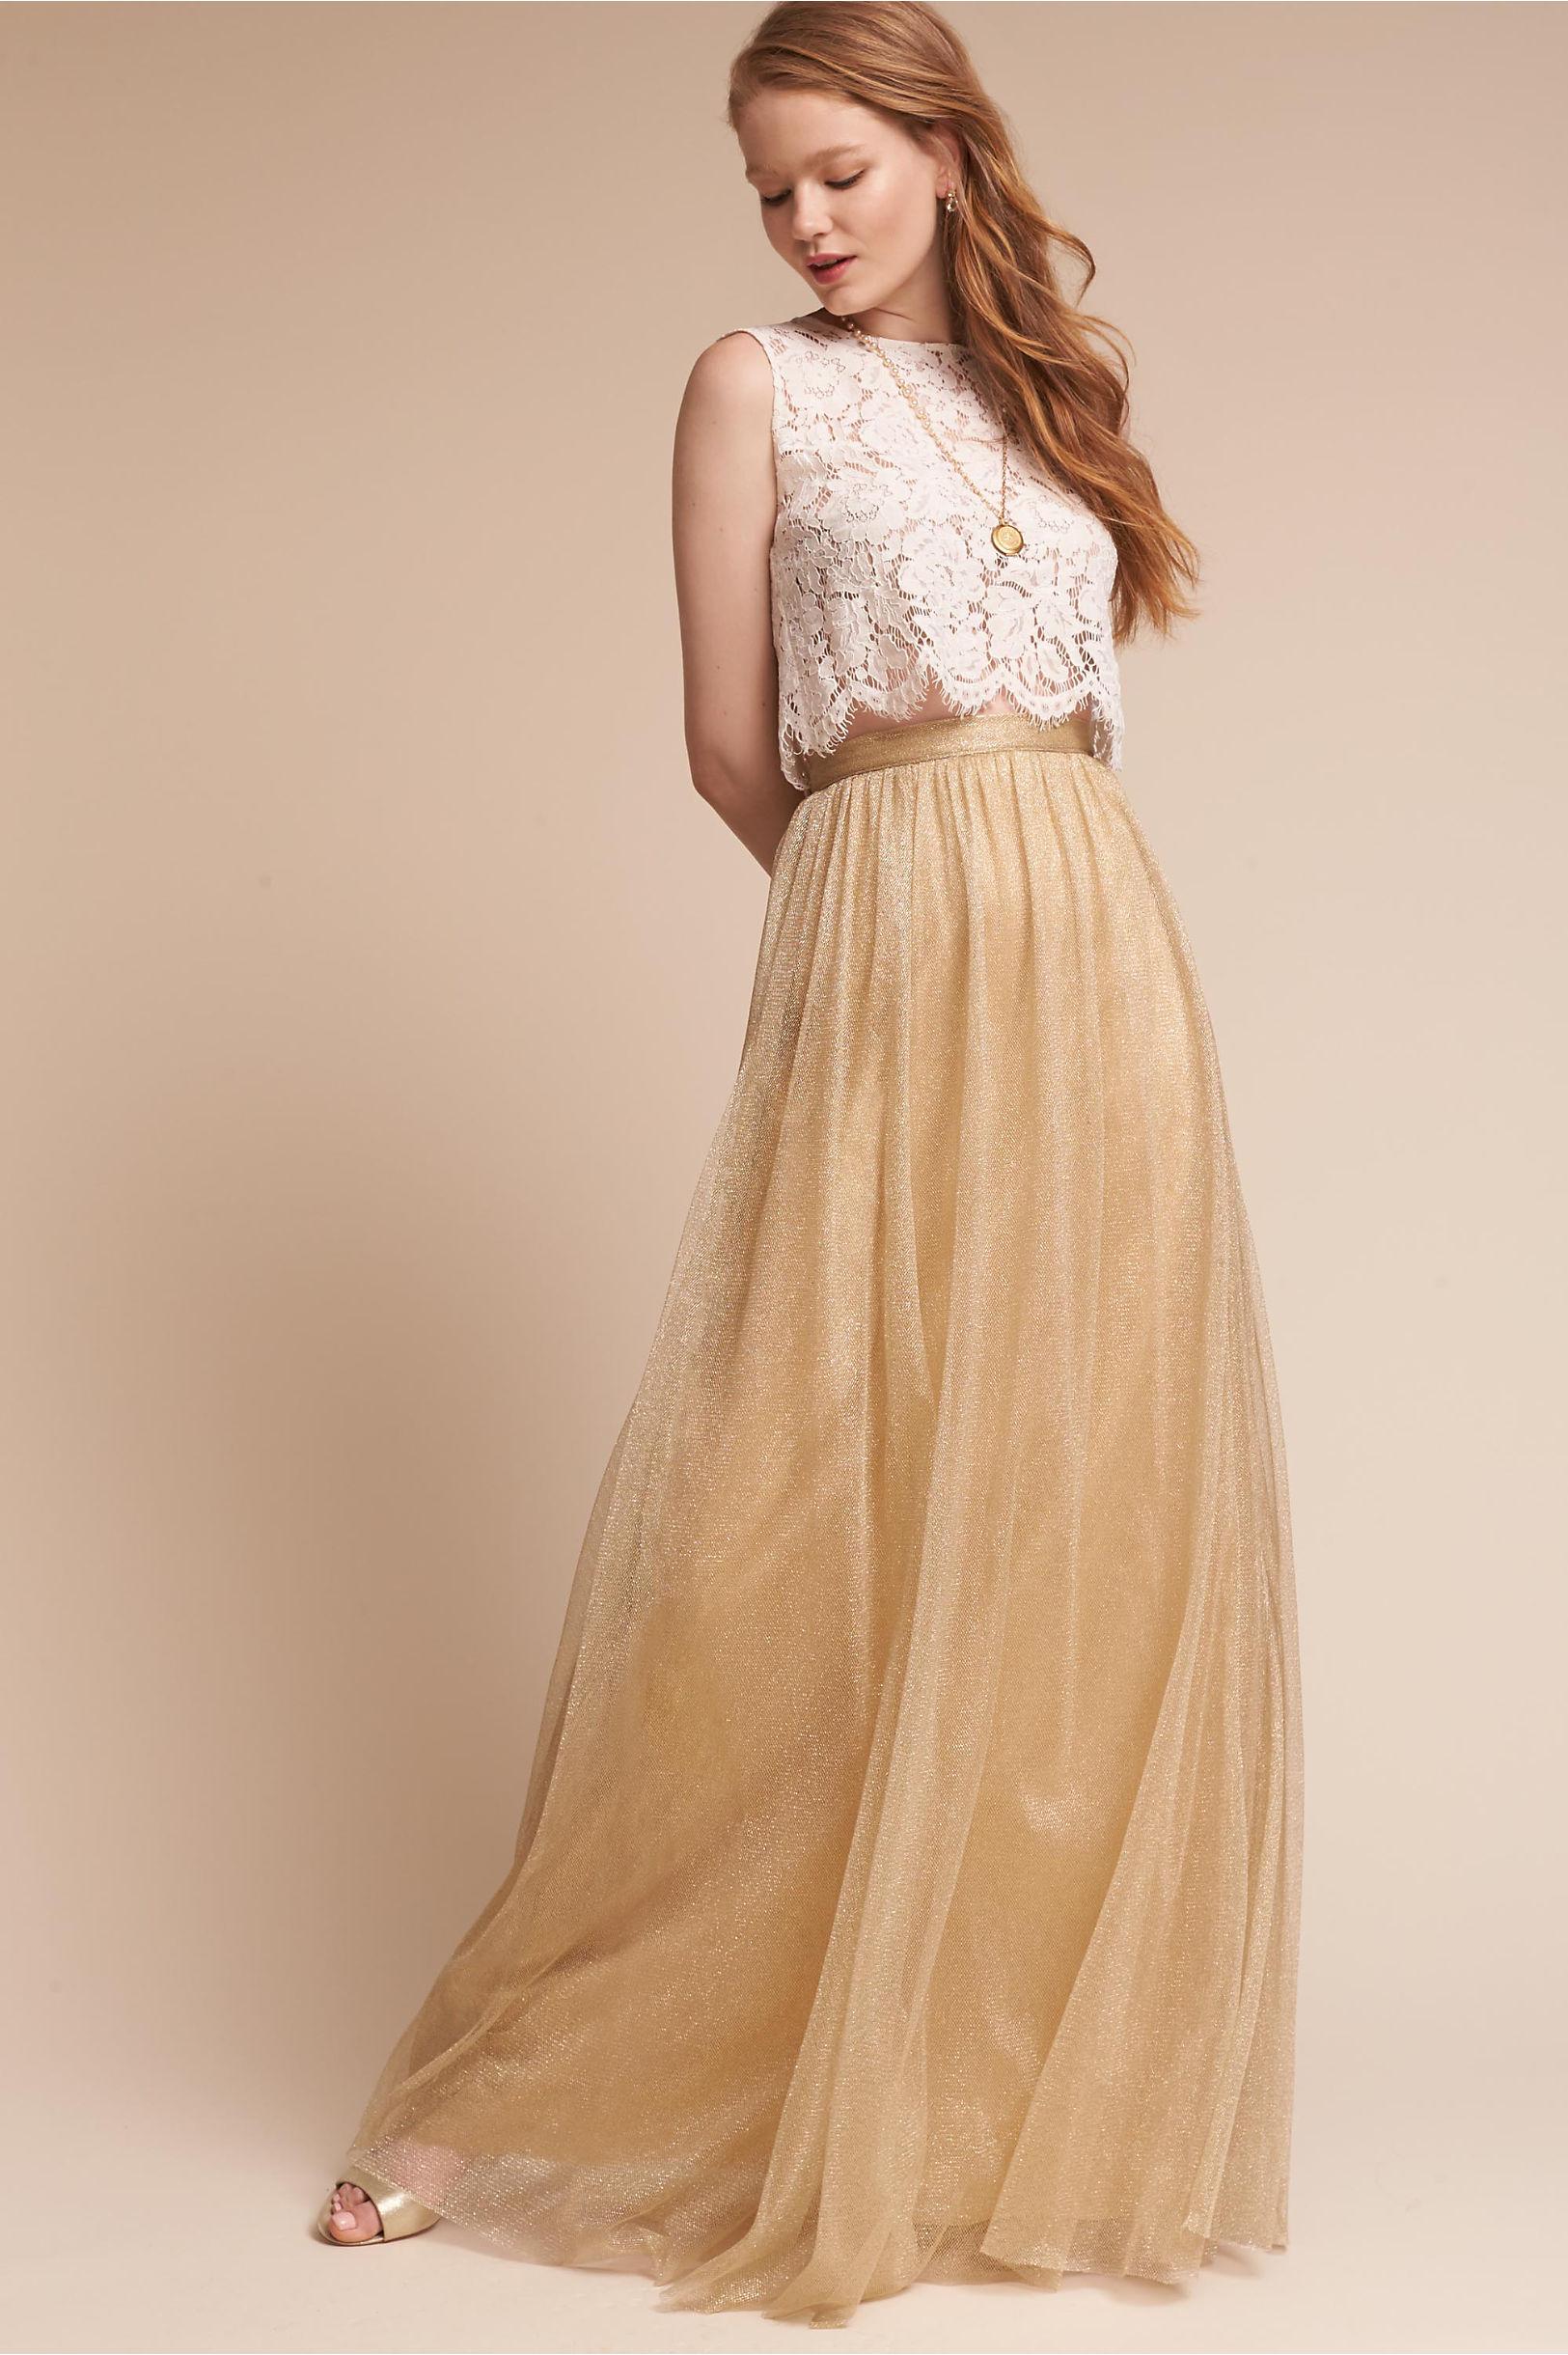 343062d4831 Jenny Yoo Metallic Gold Louise Tulle Skirt